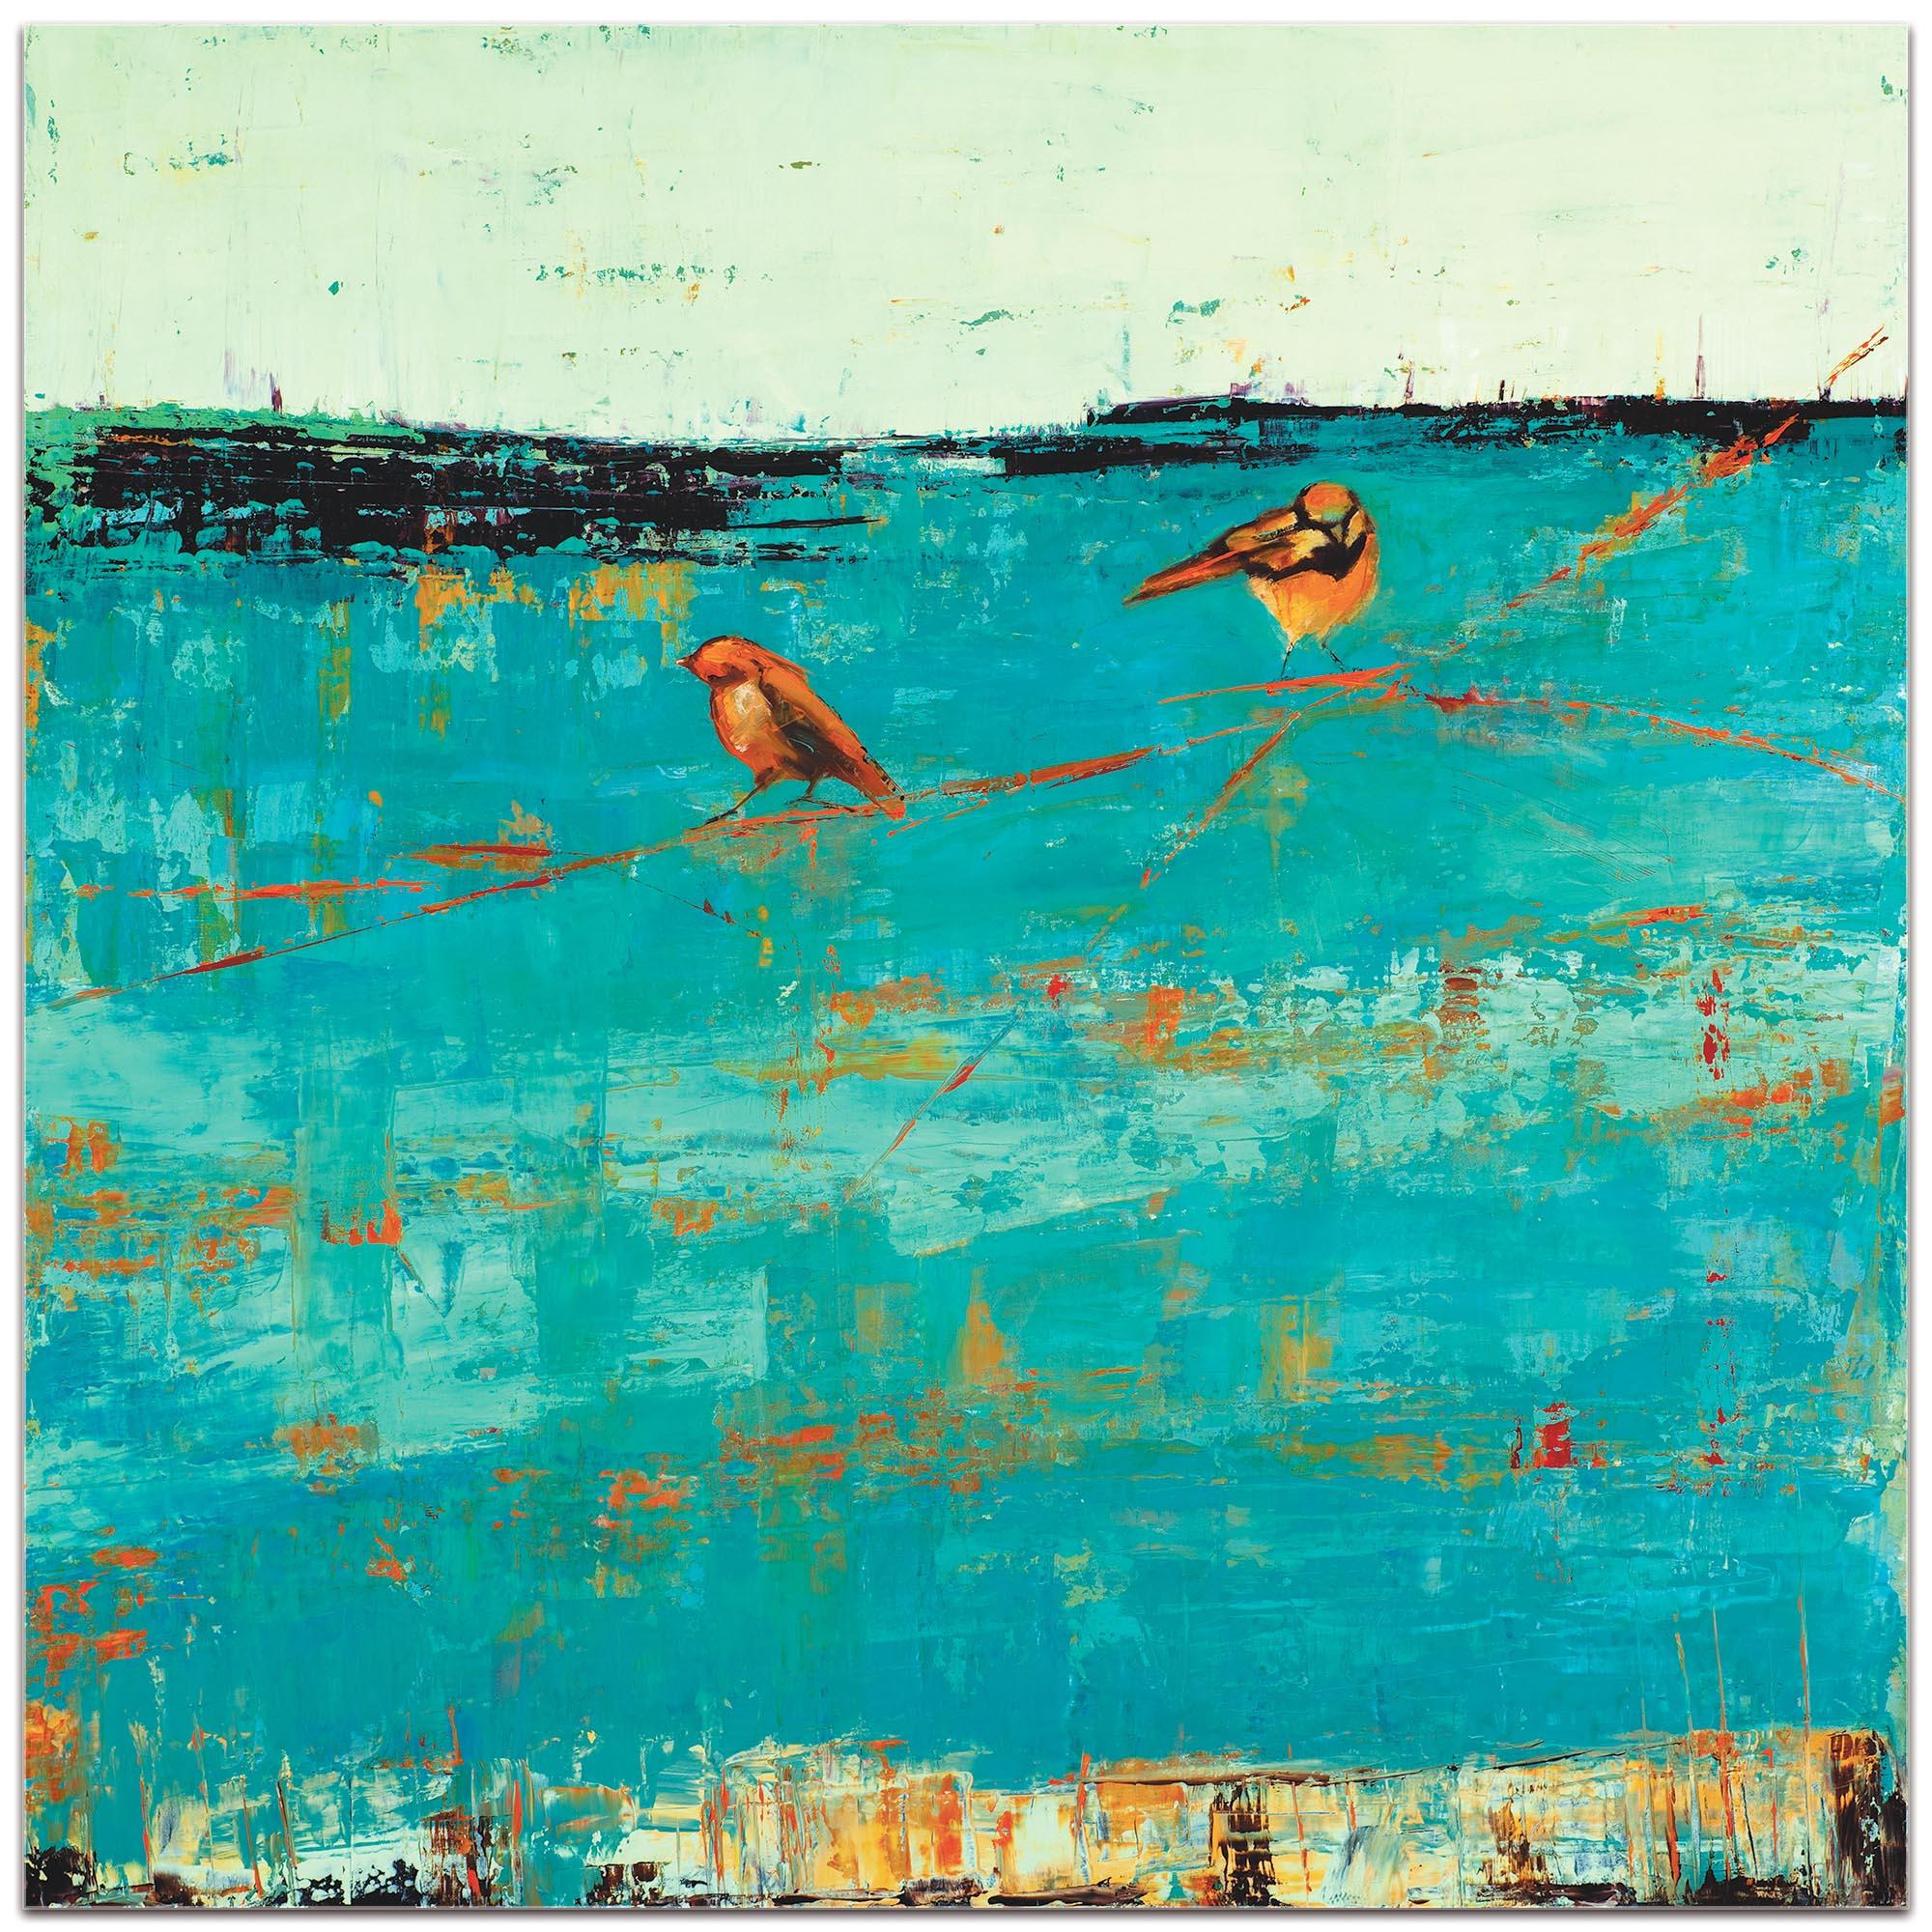 Contemporary Wall Art 'Two Chickadees on a Blue Horizon' - Urban Birds Decor on Metal or Plexiglass - Image 2